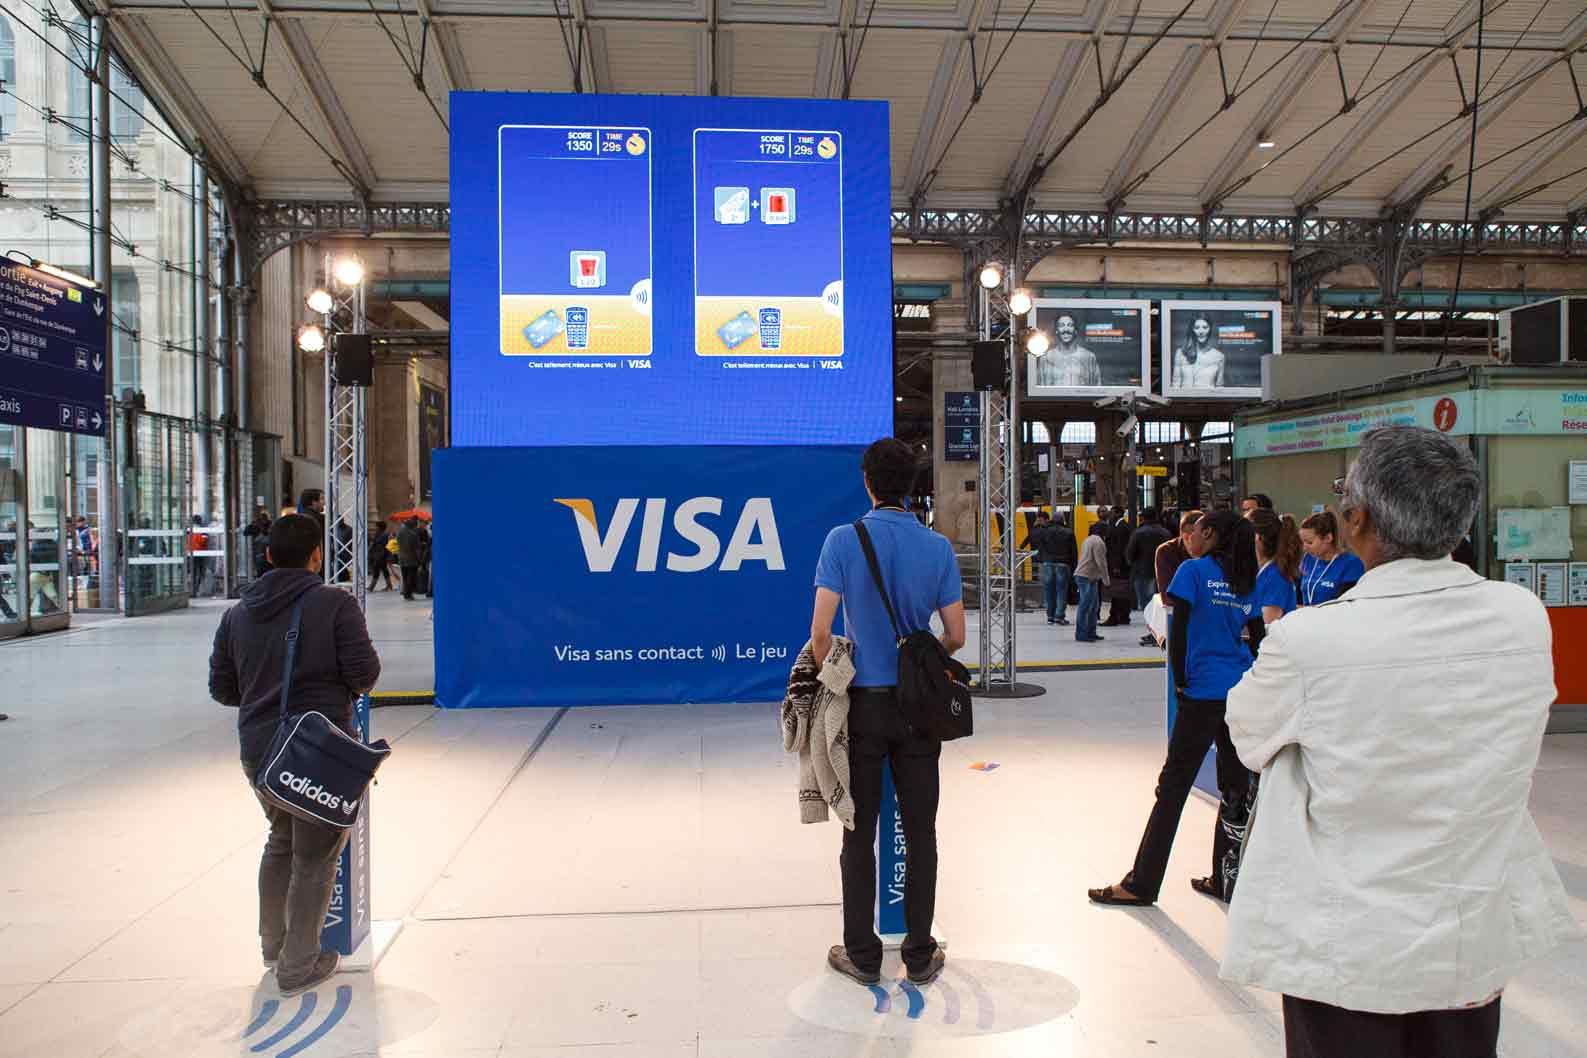 VisaGareProject2013>stage6.jpg